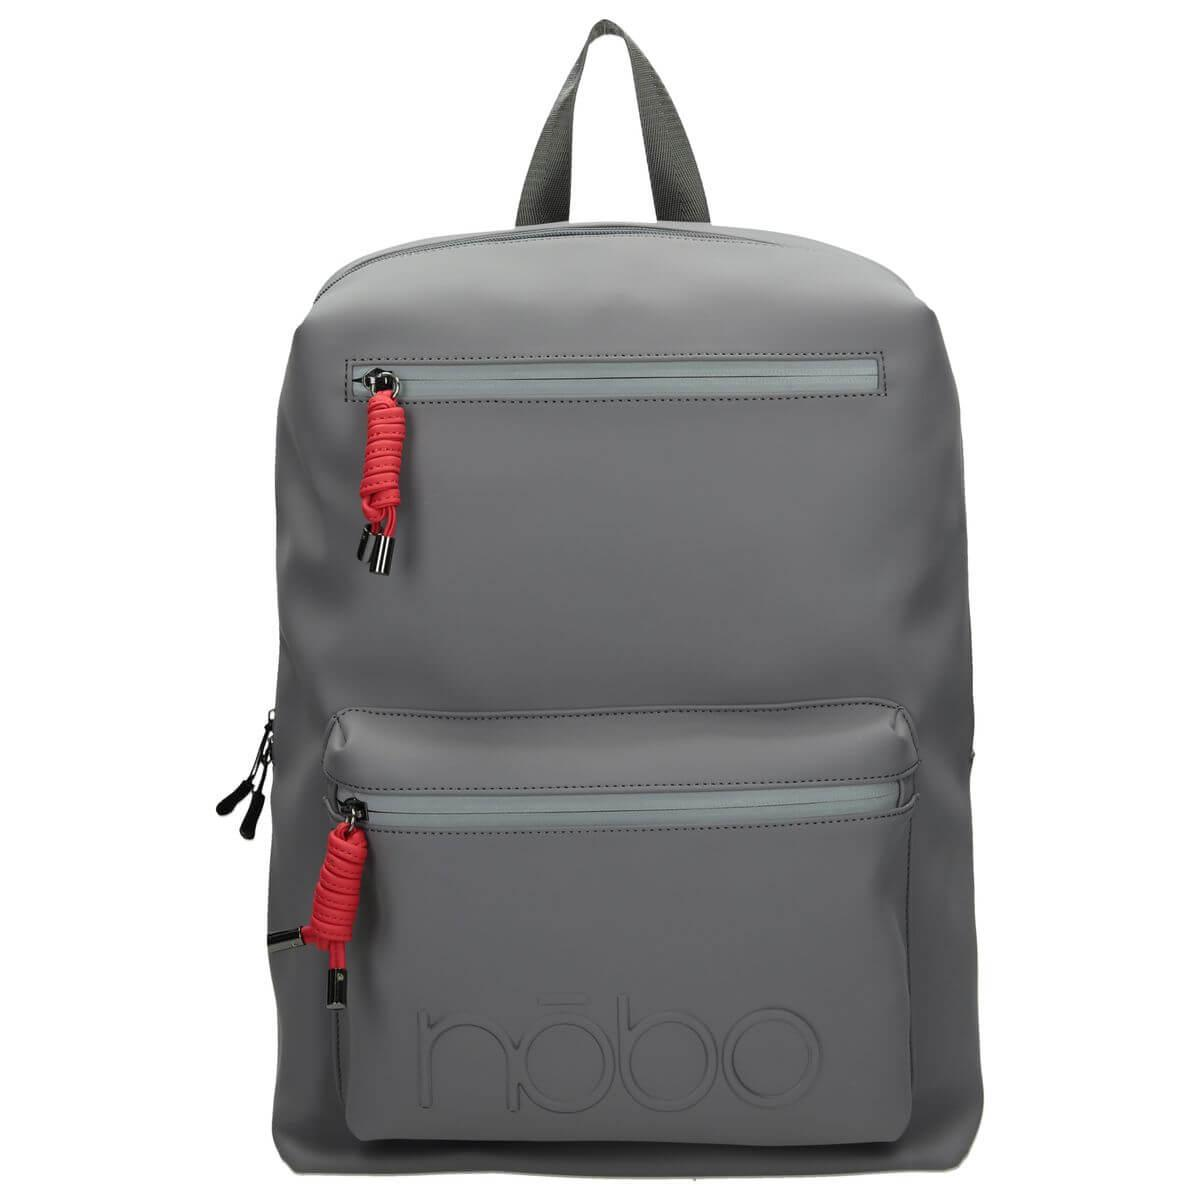 Рюкзак жіночий NOBO NBAG-I2510-C019